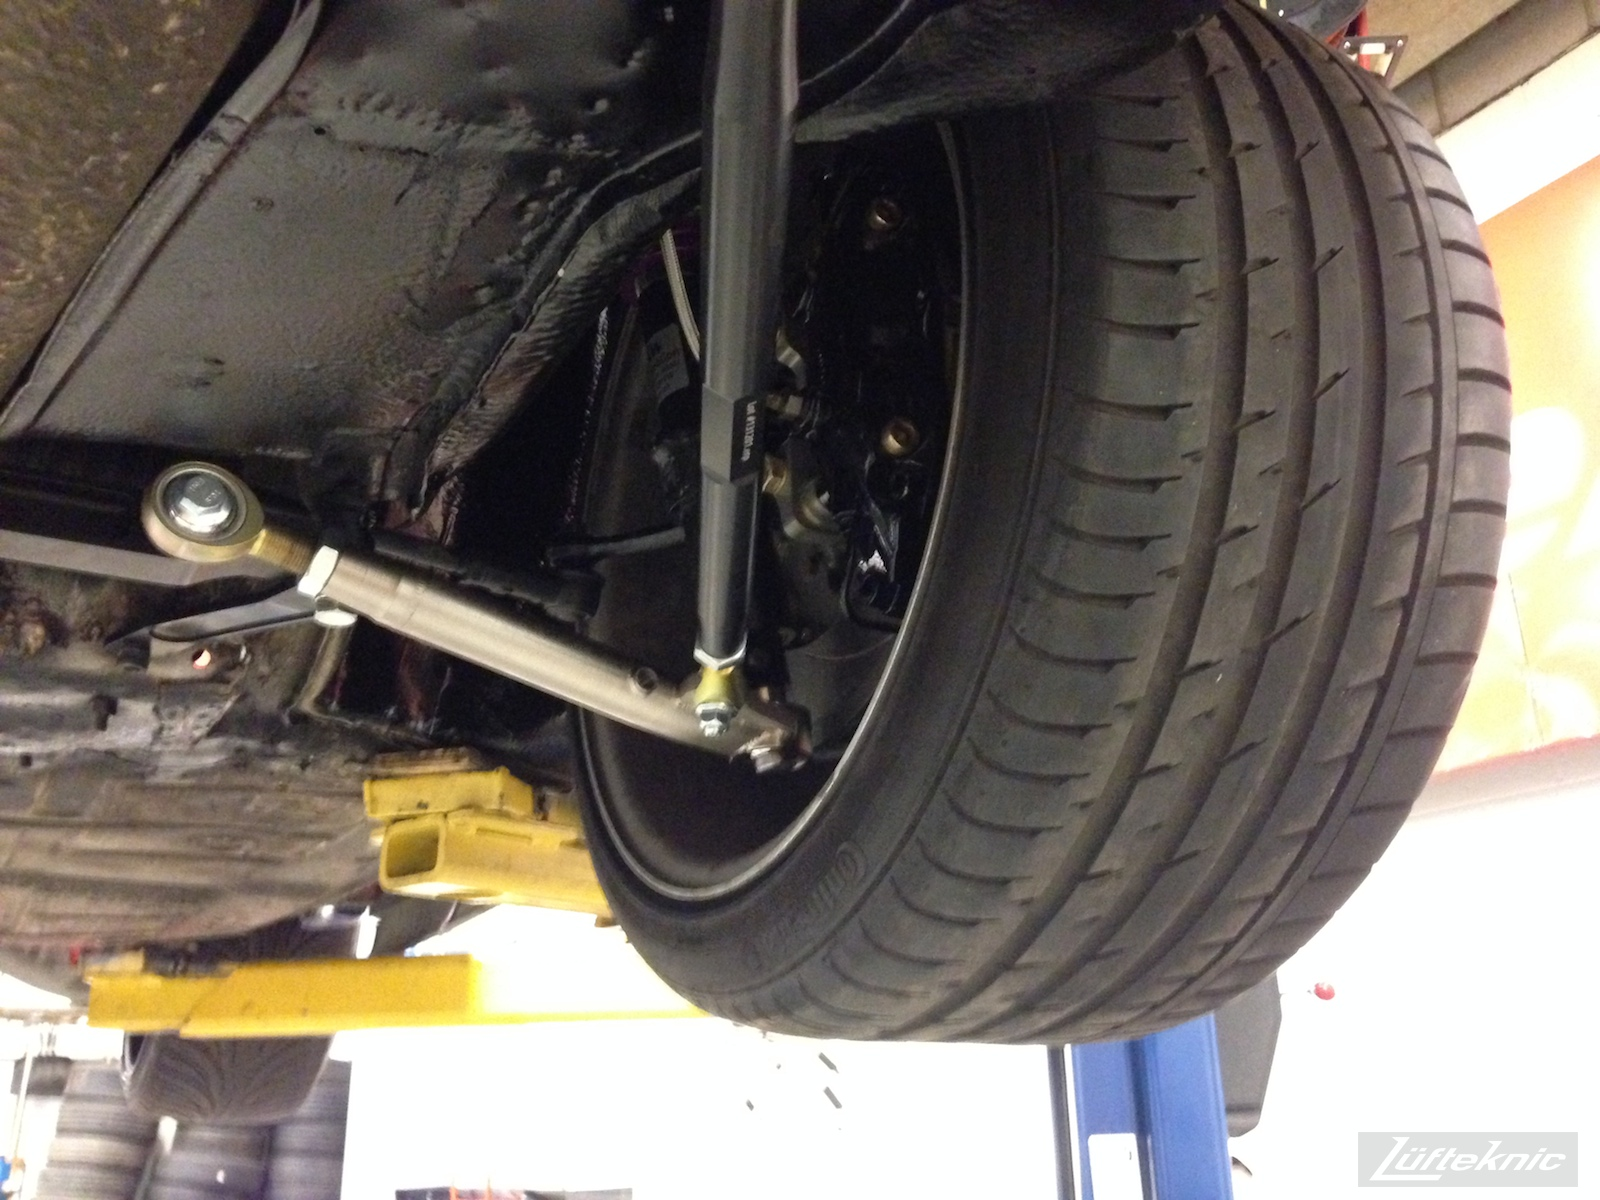 Lüfteknic #projectstuka Porsche 930 Turbo front tire, massive!